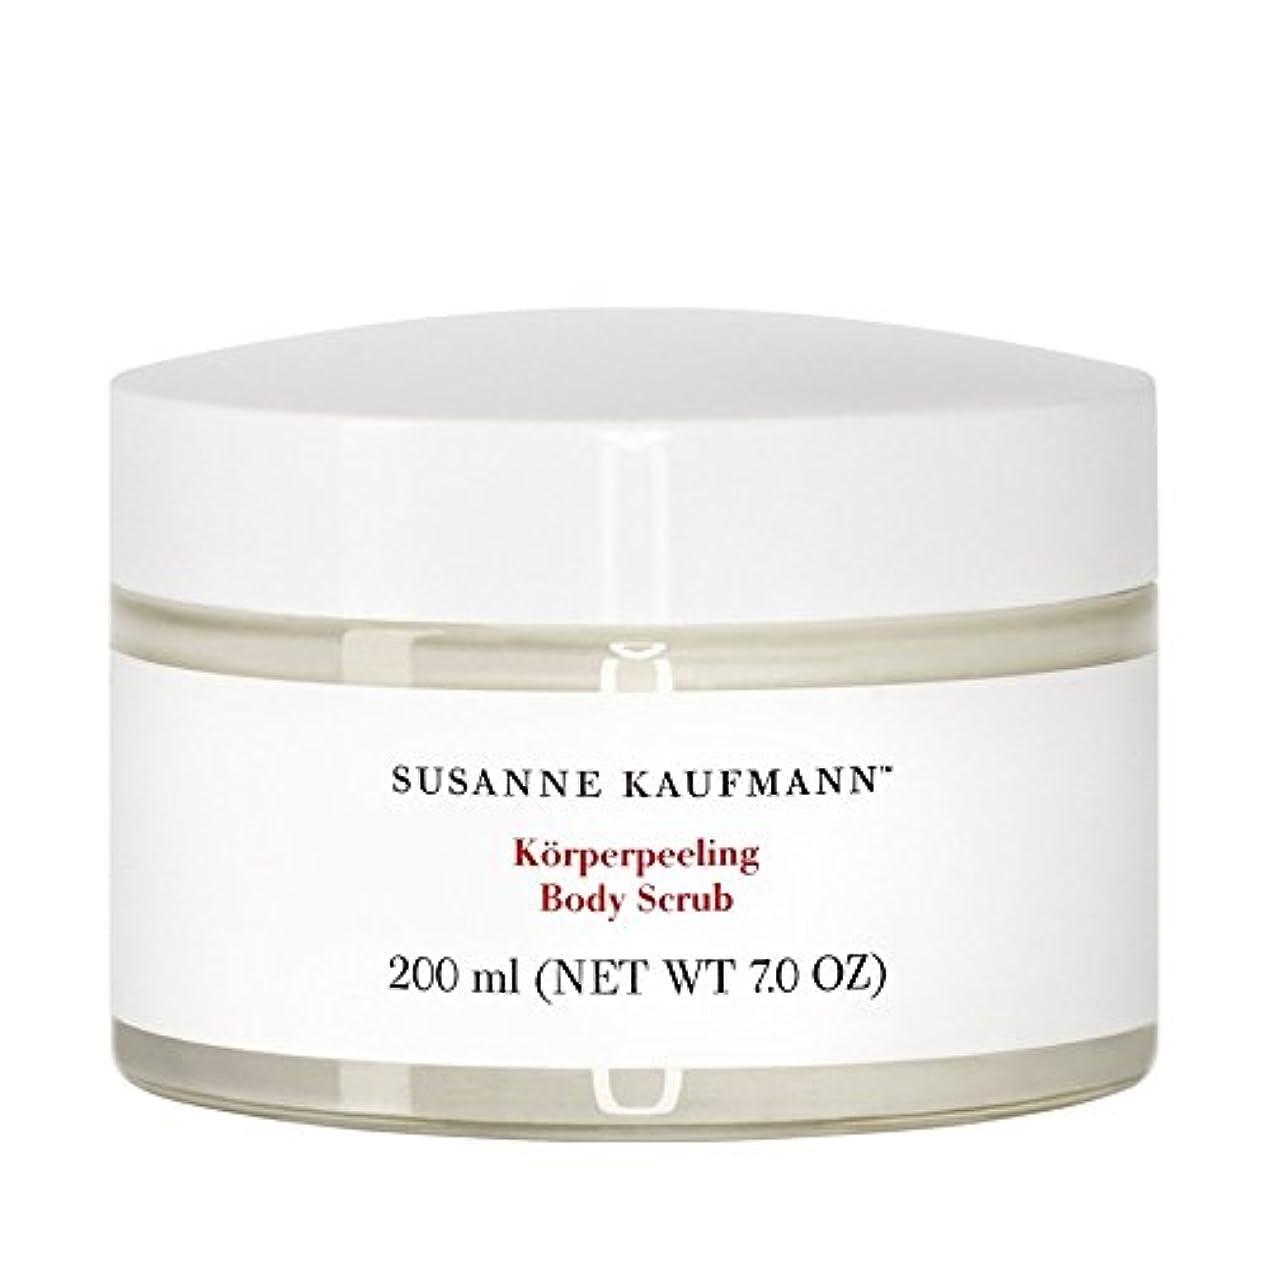 Susanne Kaufmann Body Scrub 200ml (Pack of 6) - スザンヌカウフマンボディスクラブ200ミリリットル x6 [並行輸入品]